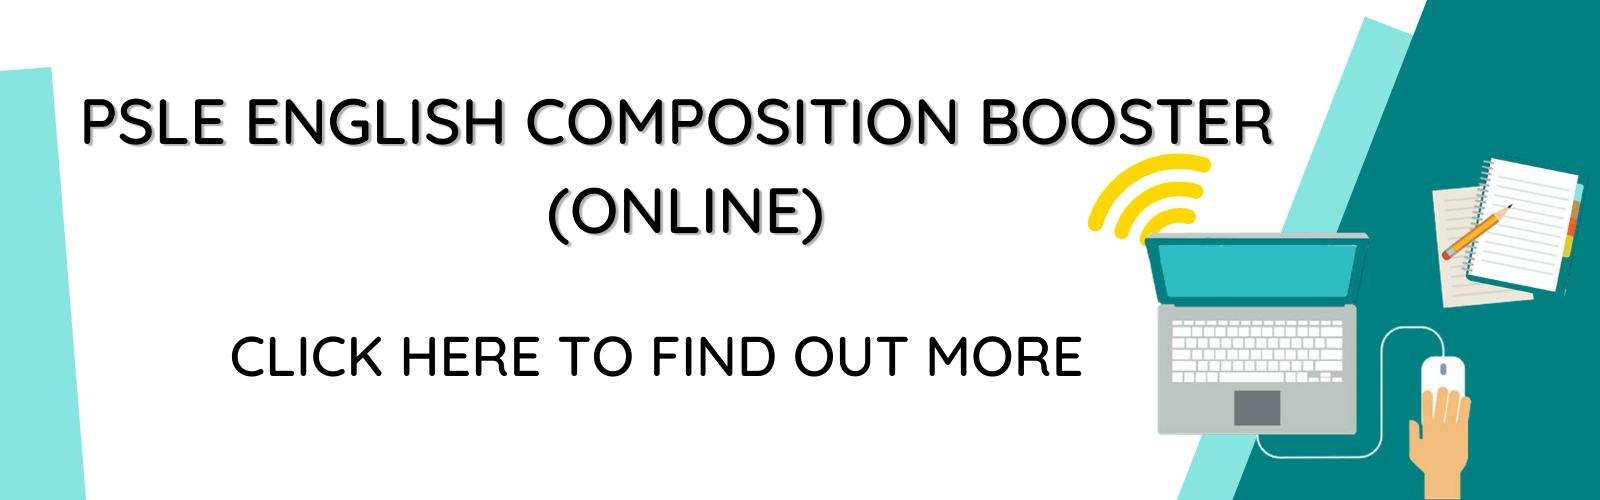 PSLE 2020 English Composition Online lesson